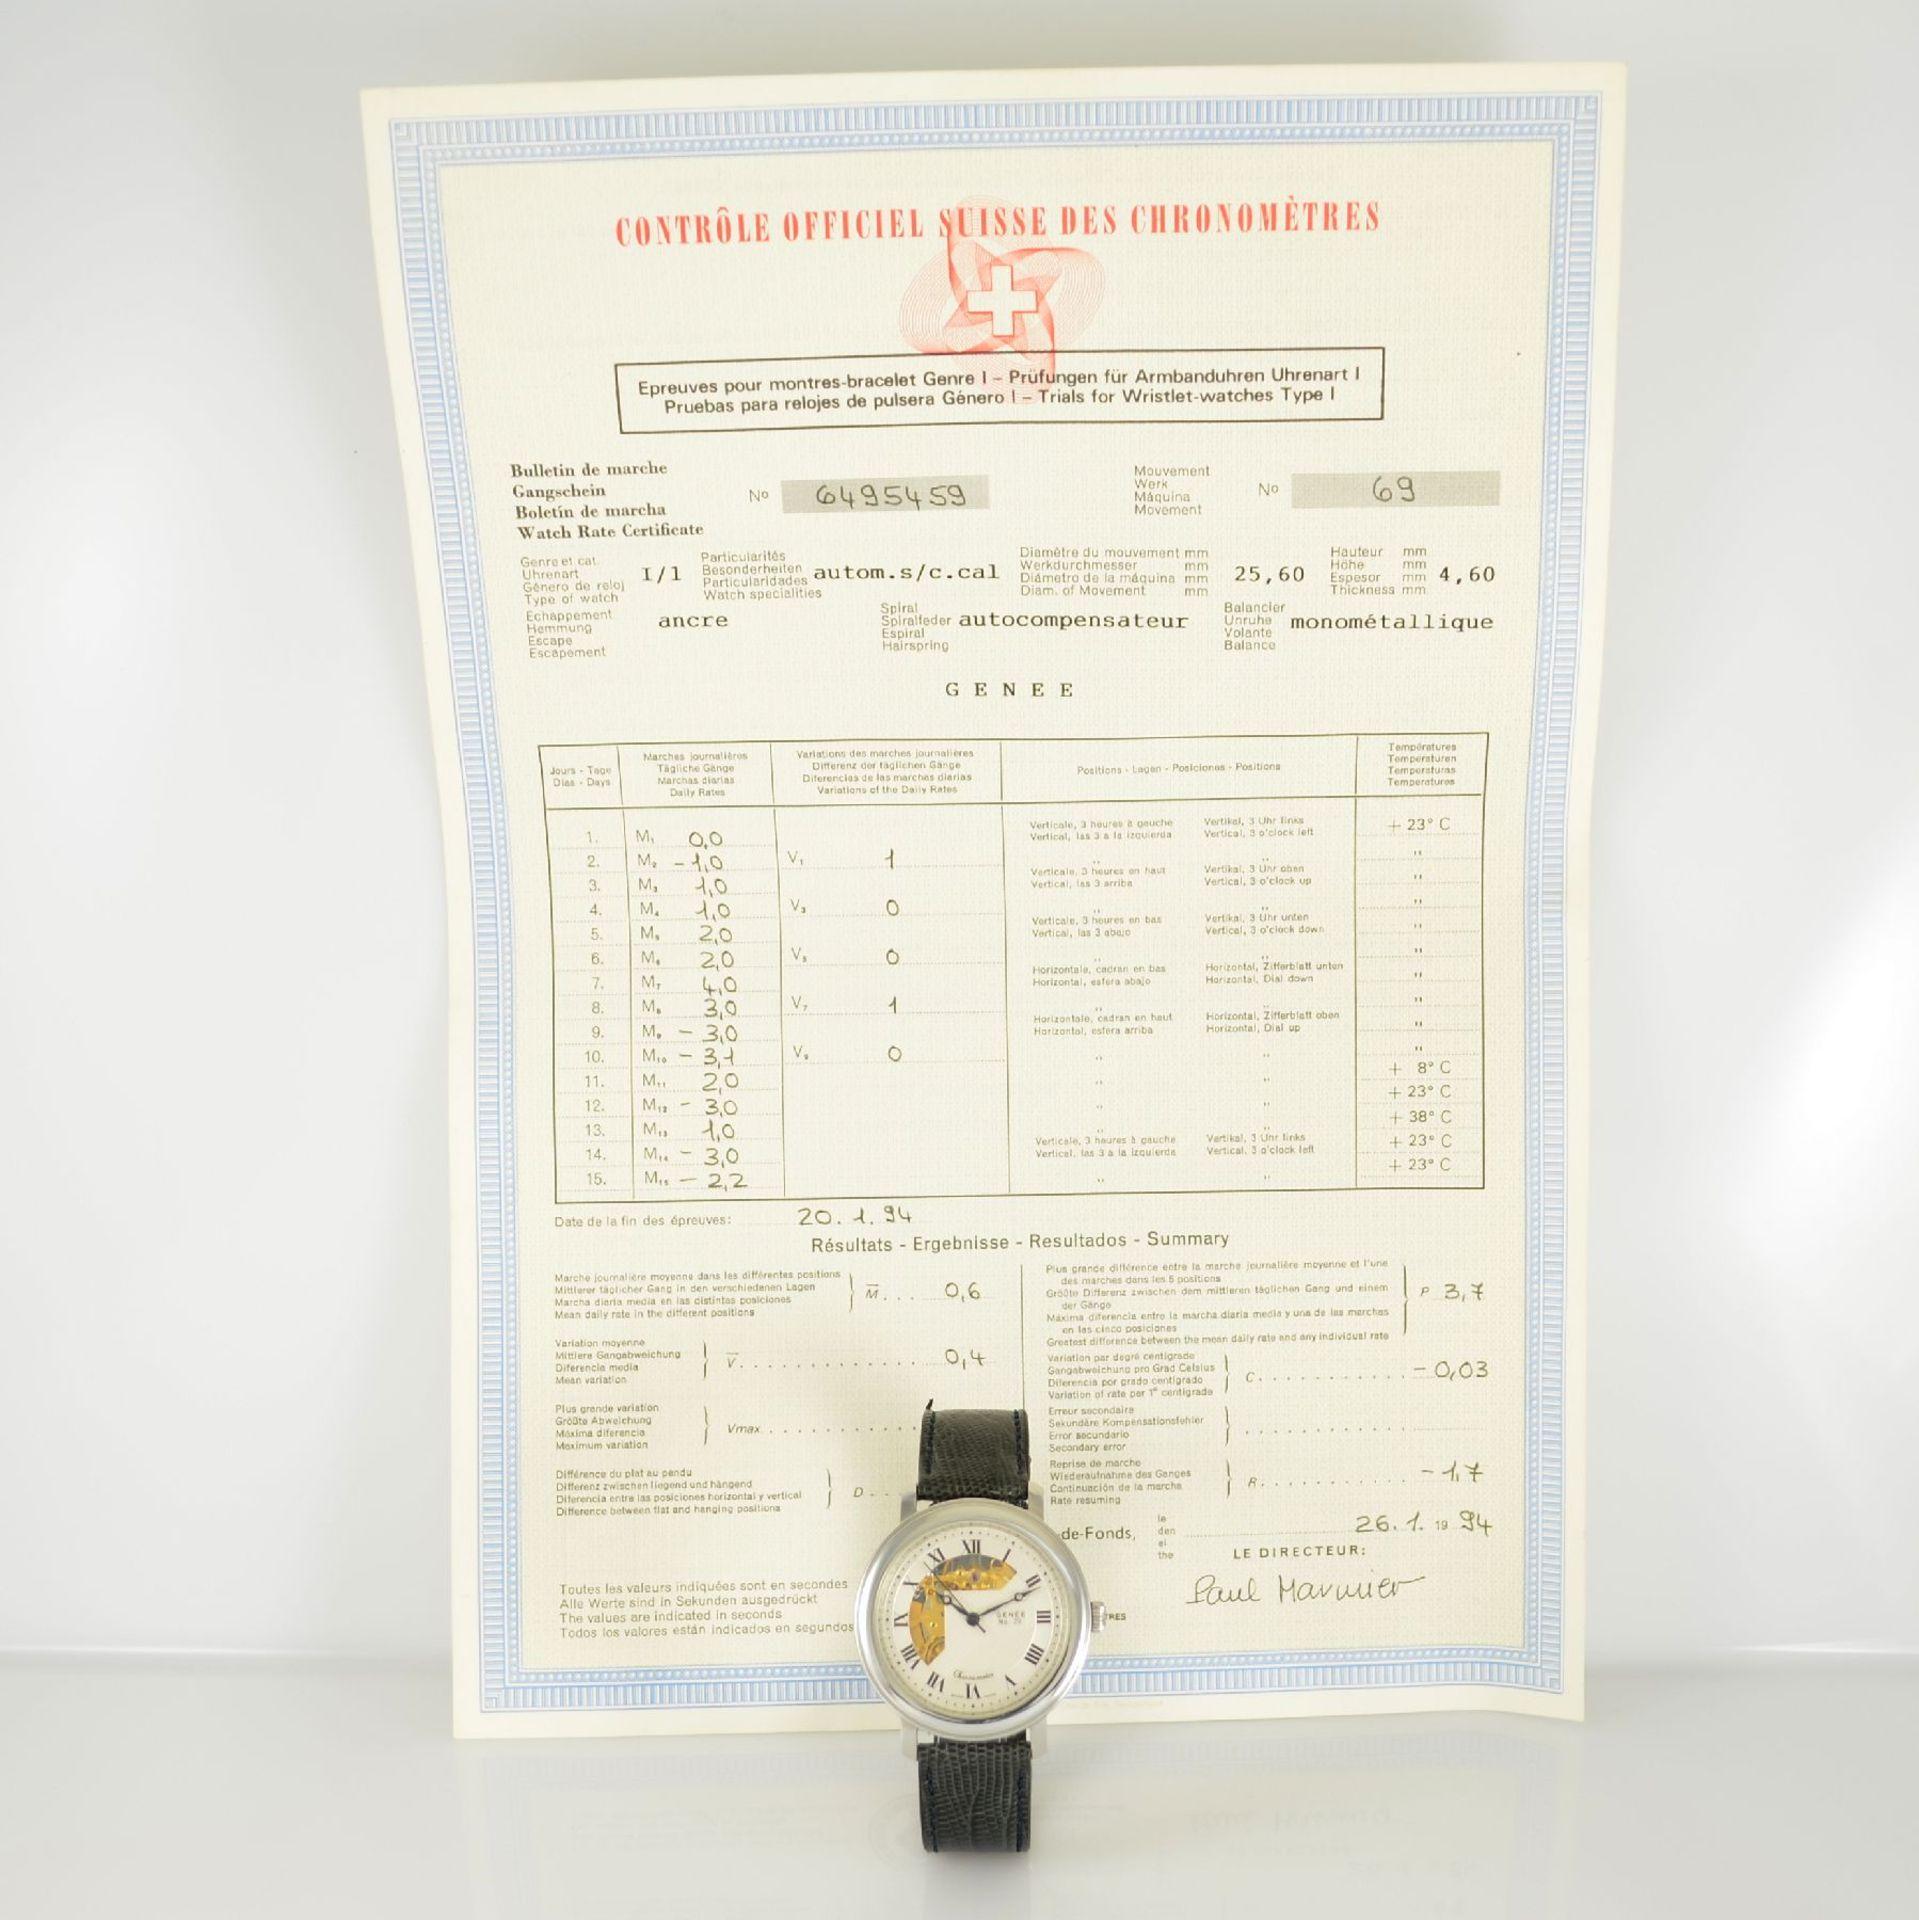 GENÉE No. 29 Chronometer-Herrenarmbanduhr in Stahl, Schweiz lt. beiliegendem Chronometerzertifikat - Bild 8 aus 8